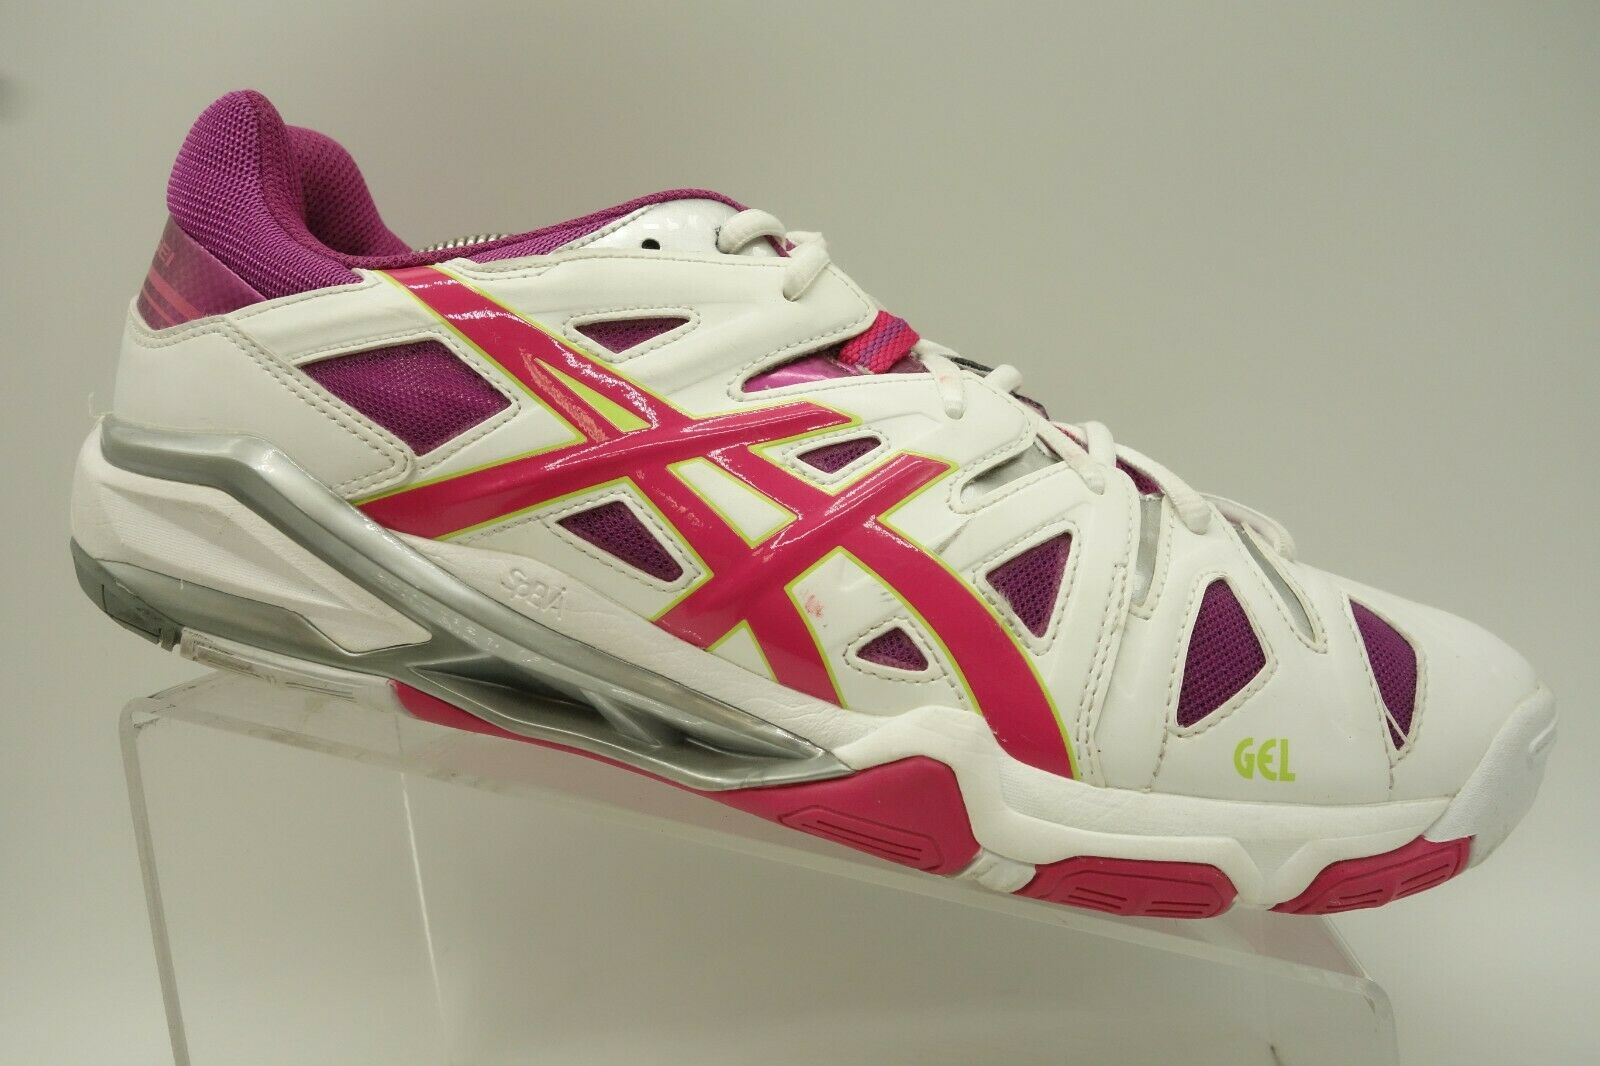 Asics Gel Sensei Multi-color Lace Up Athletic Basketball shoes Women's 13